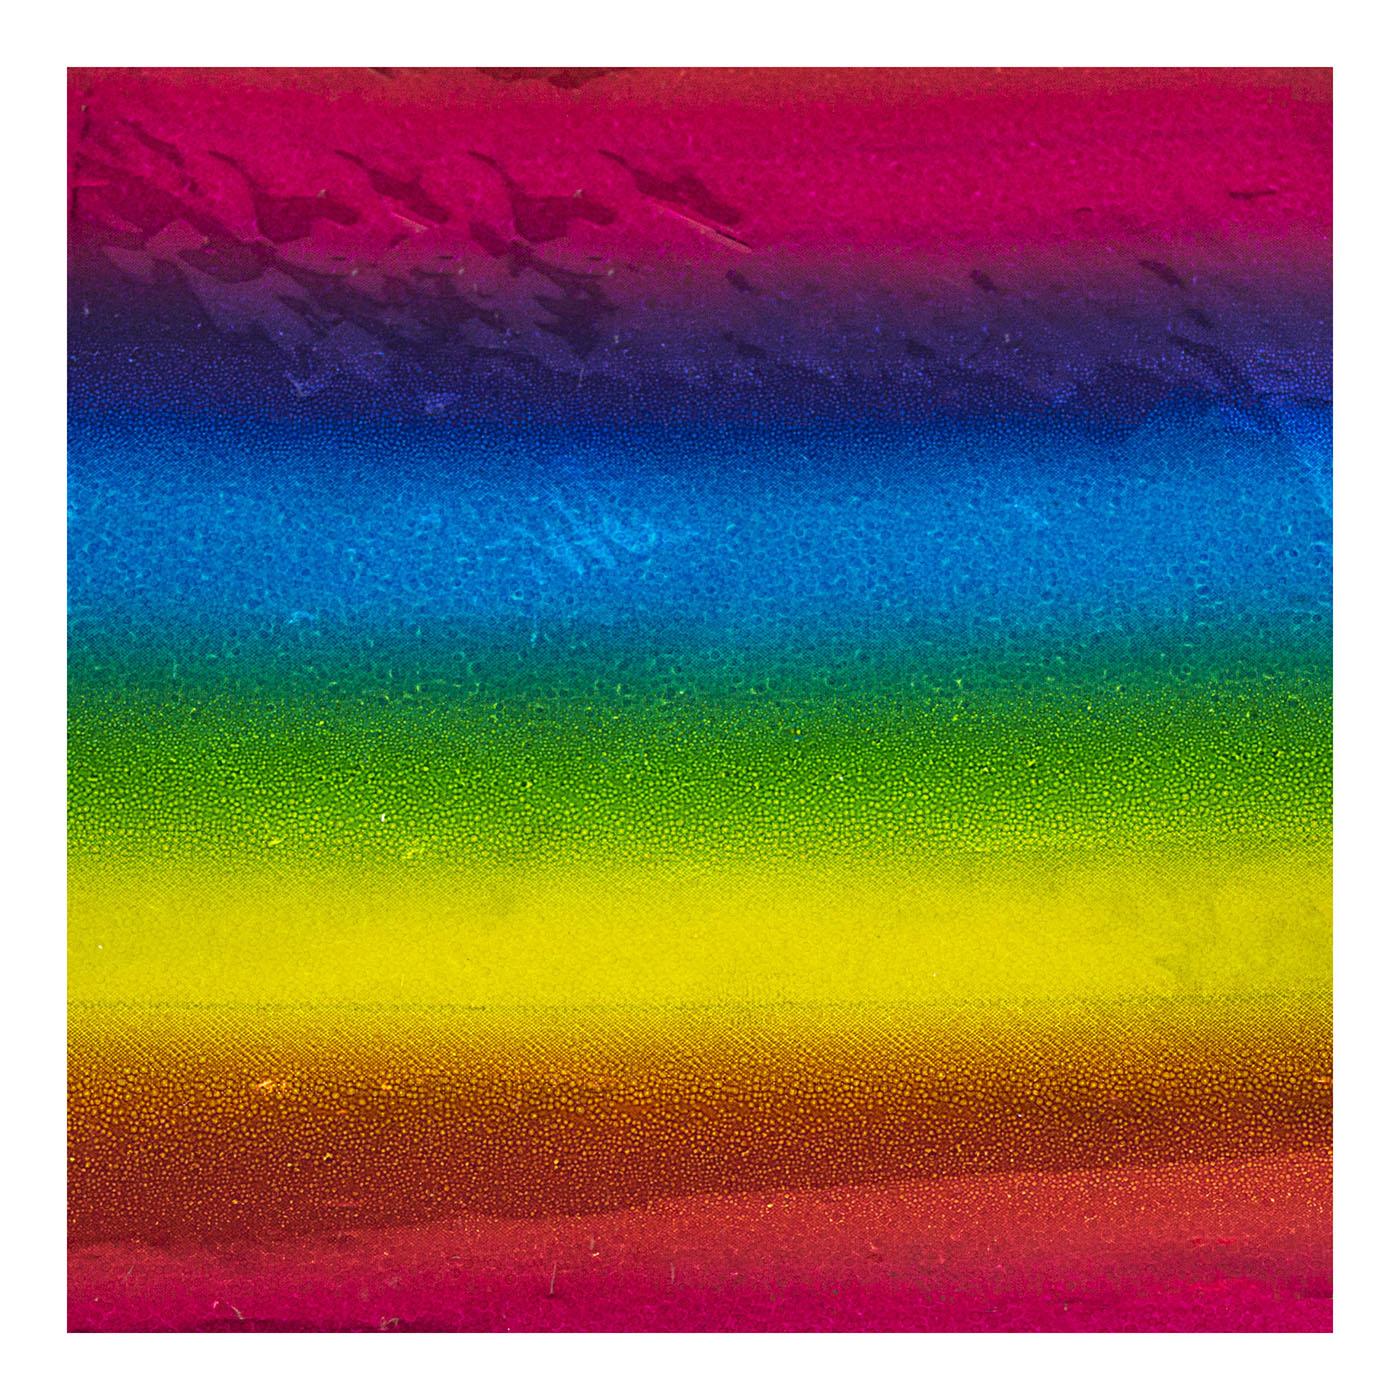 cenefa polka dots einfassband trozos de metal varios colores − 1m planos inclinados banda